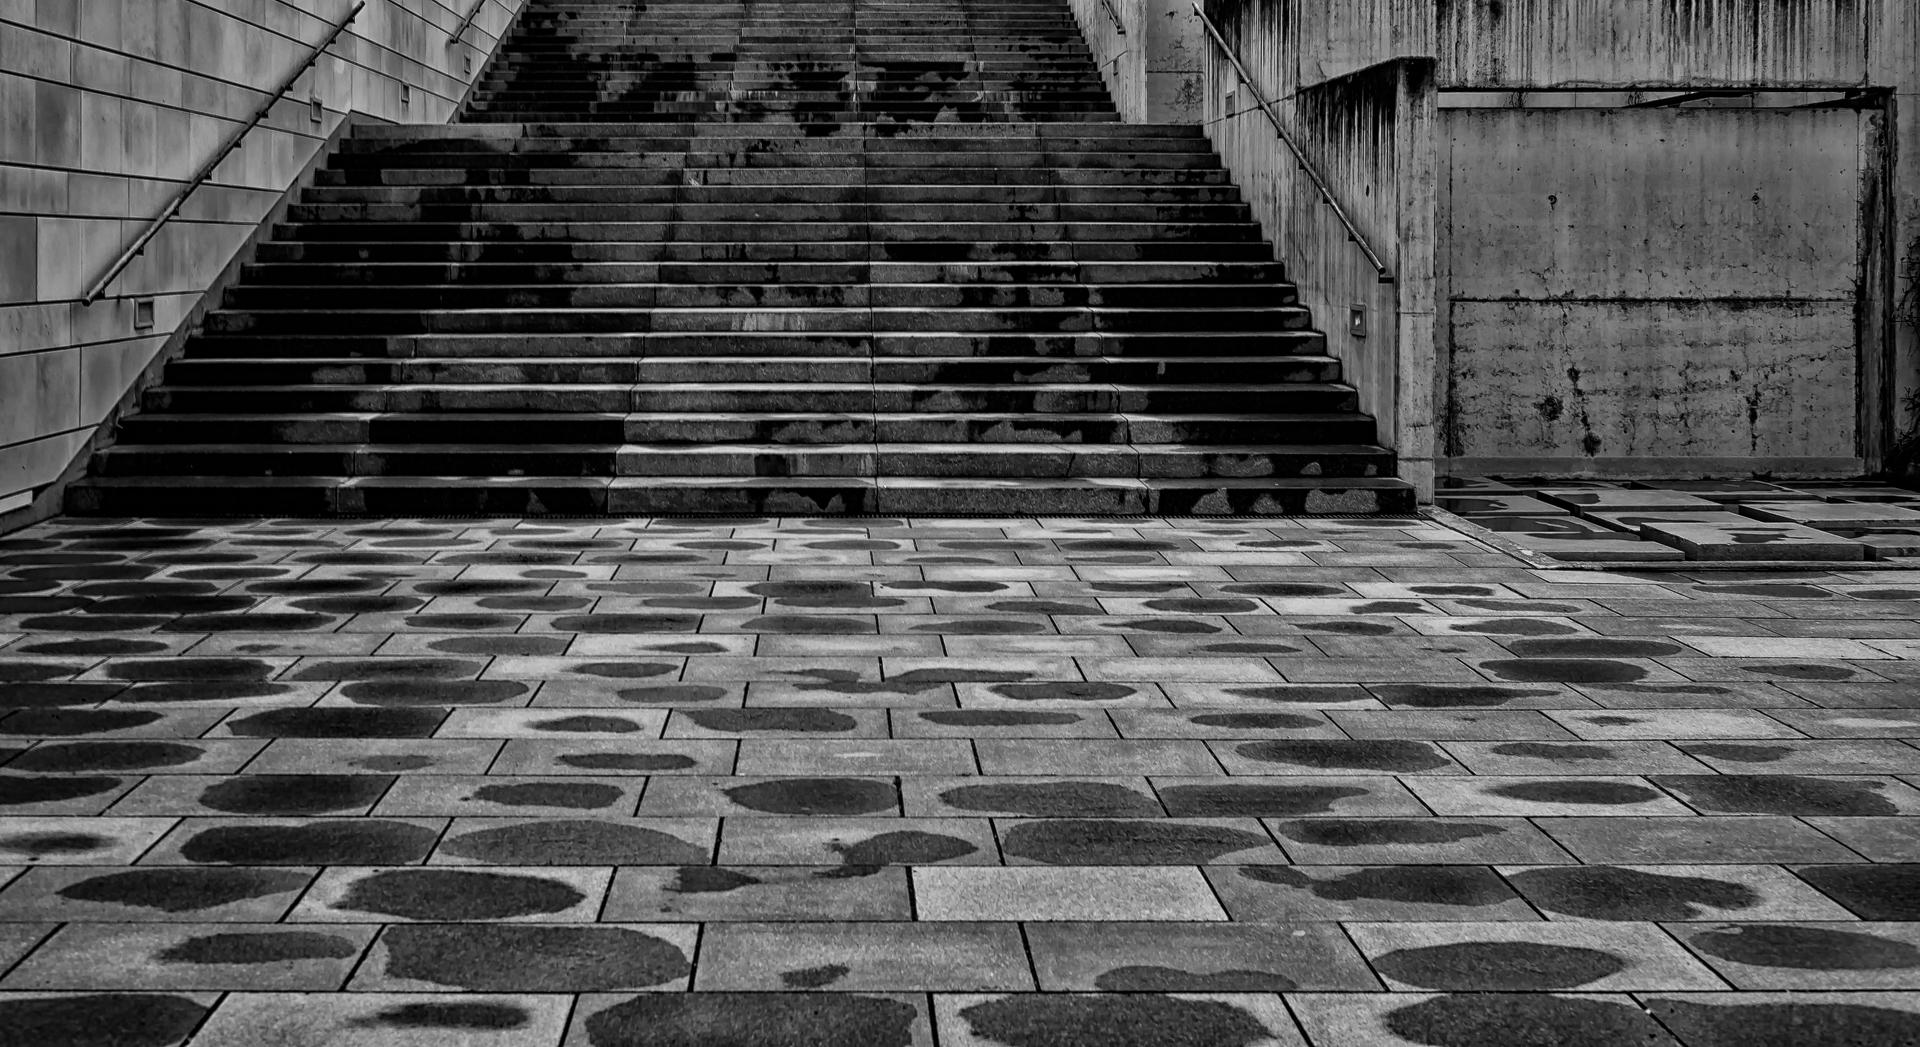 concrete.wet